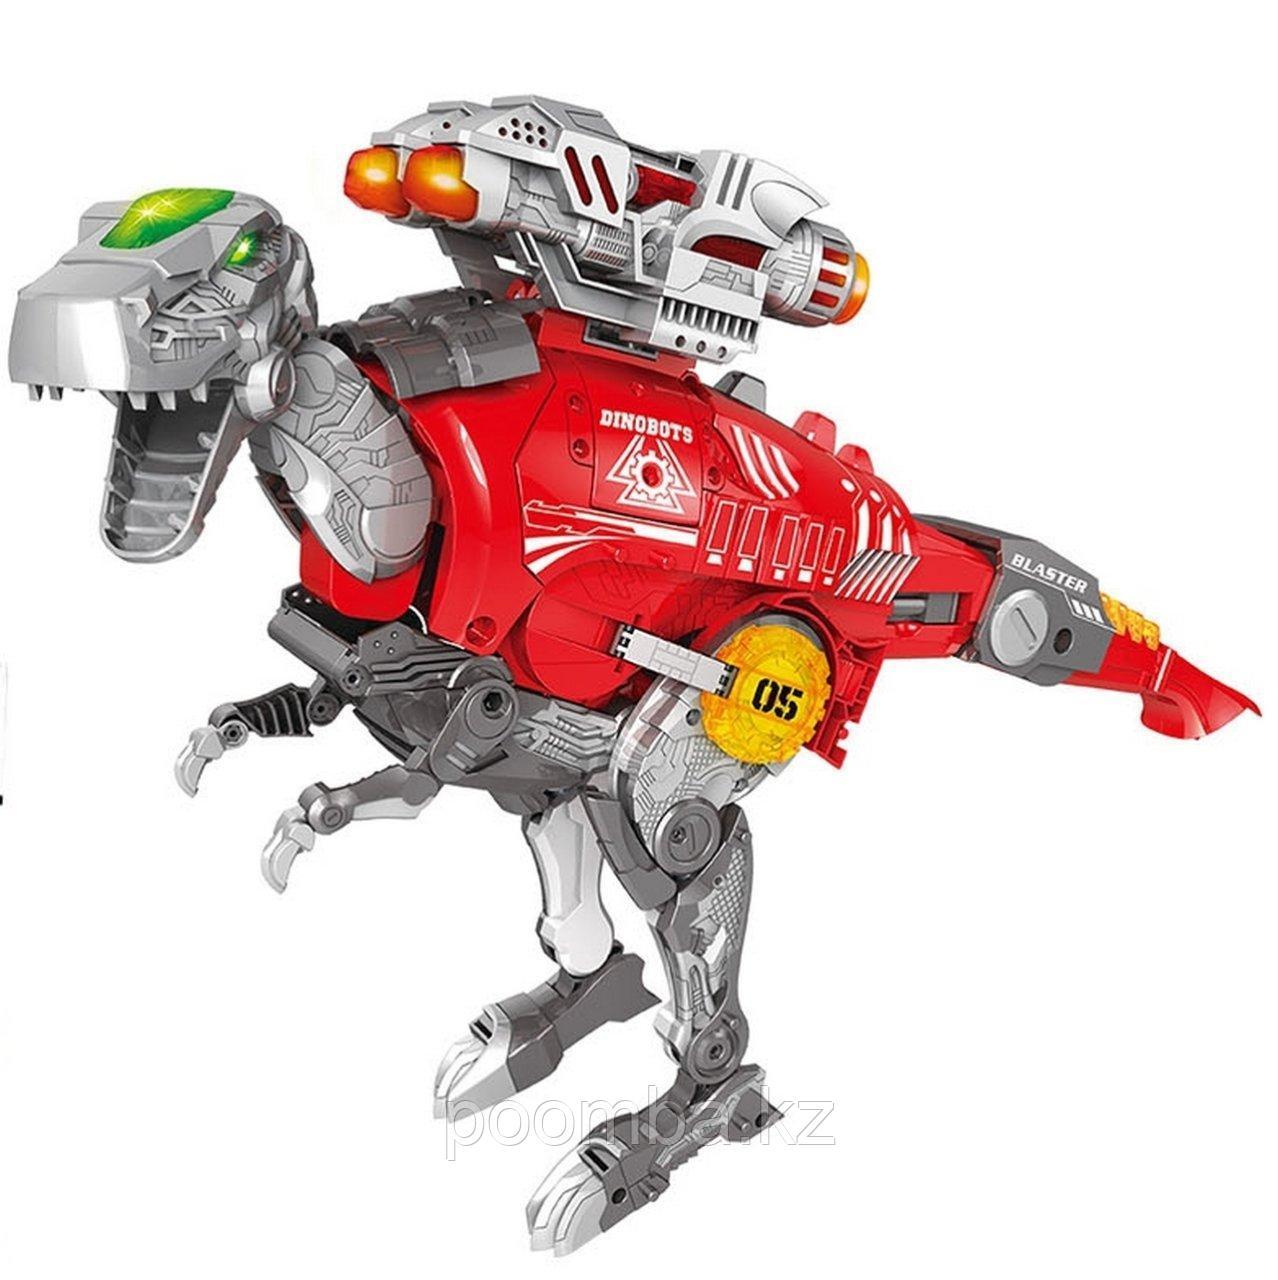 Transformer Dinobots